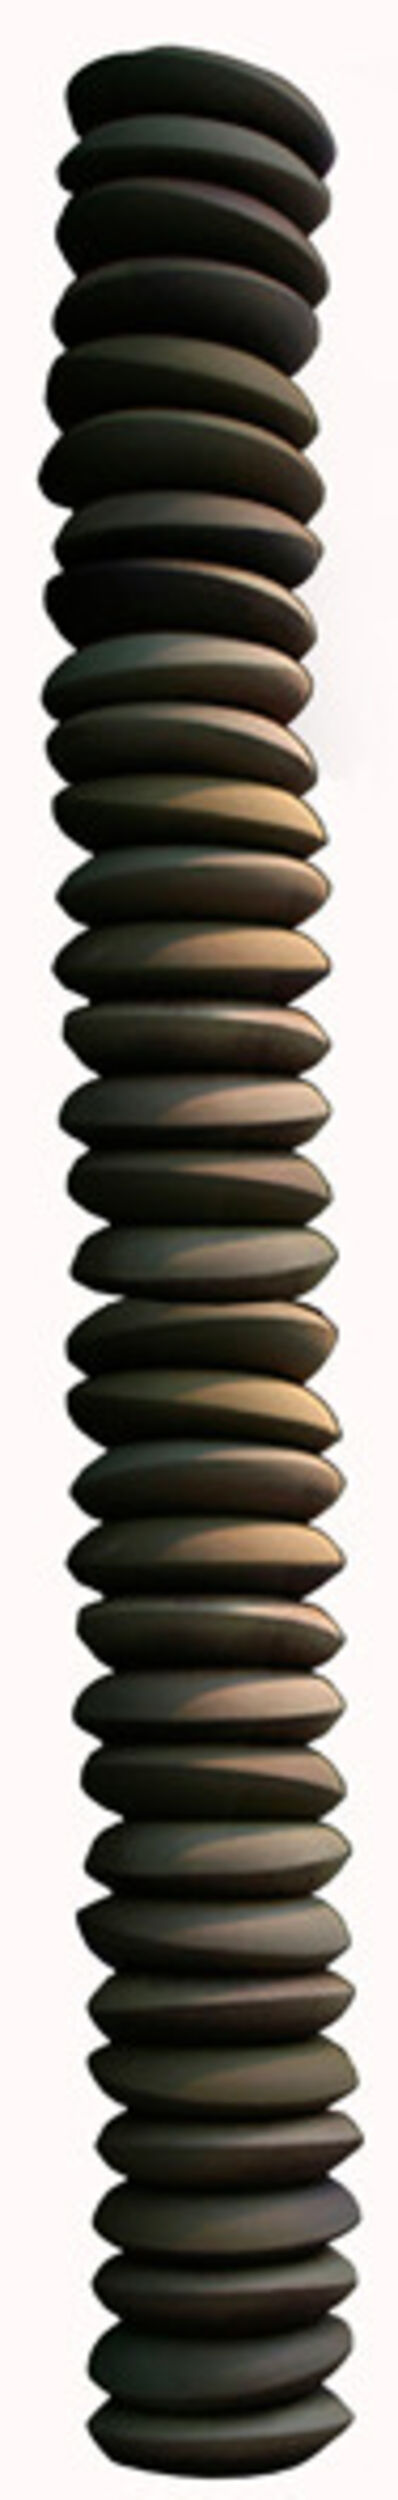 Kimi Nii, 'Coluna Semente', 2007